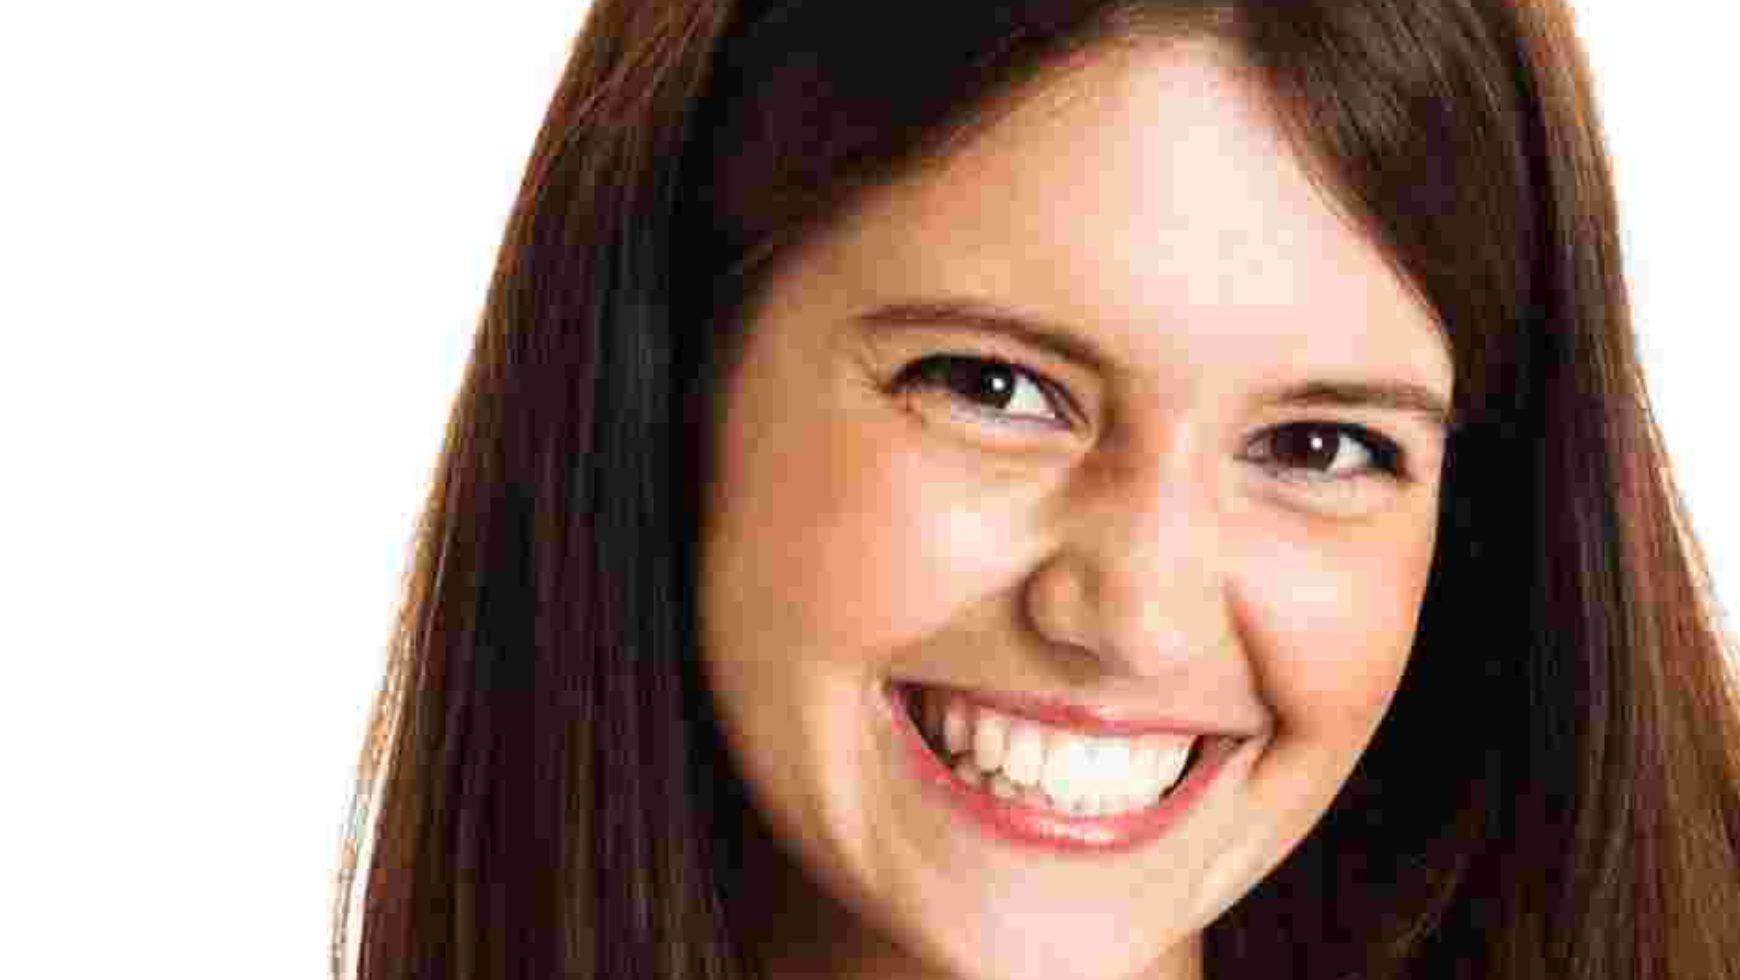 Julia Tinkerbell